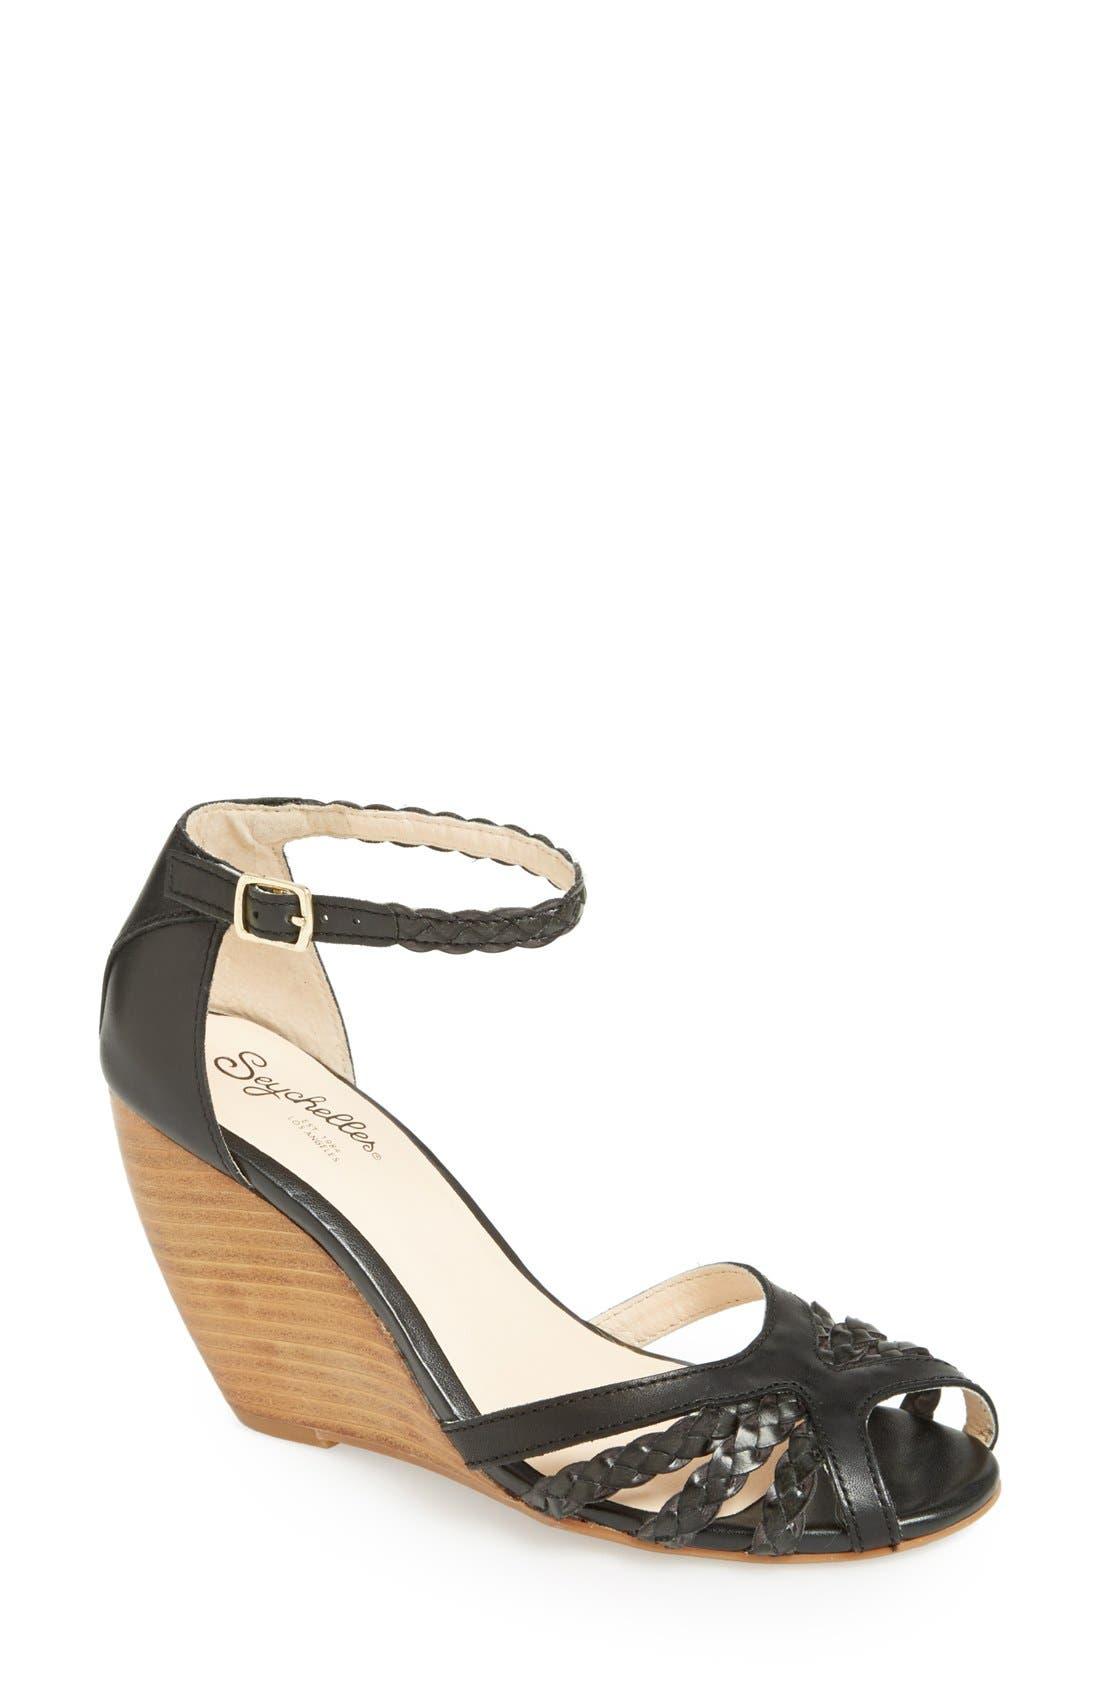 Alternate Image 1 Selected - Seychelles 'Like a Lady' Wedge Sandal (Women)